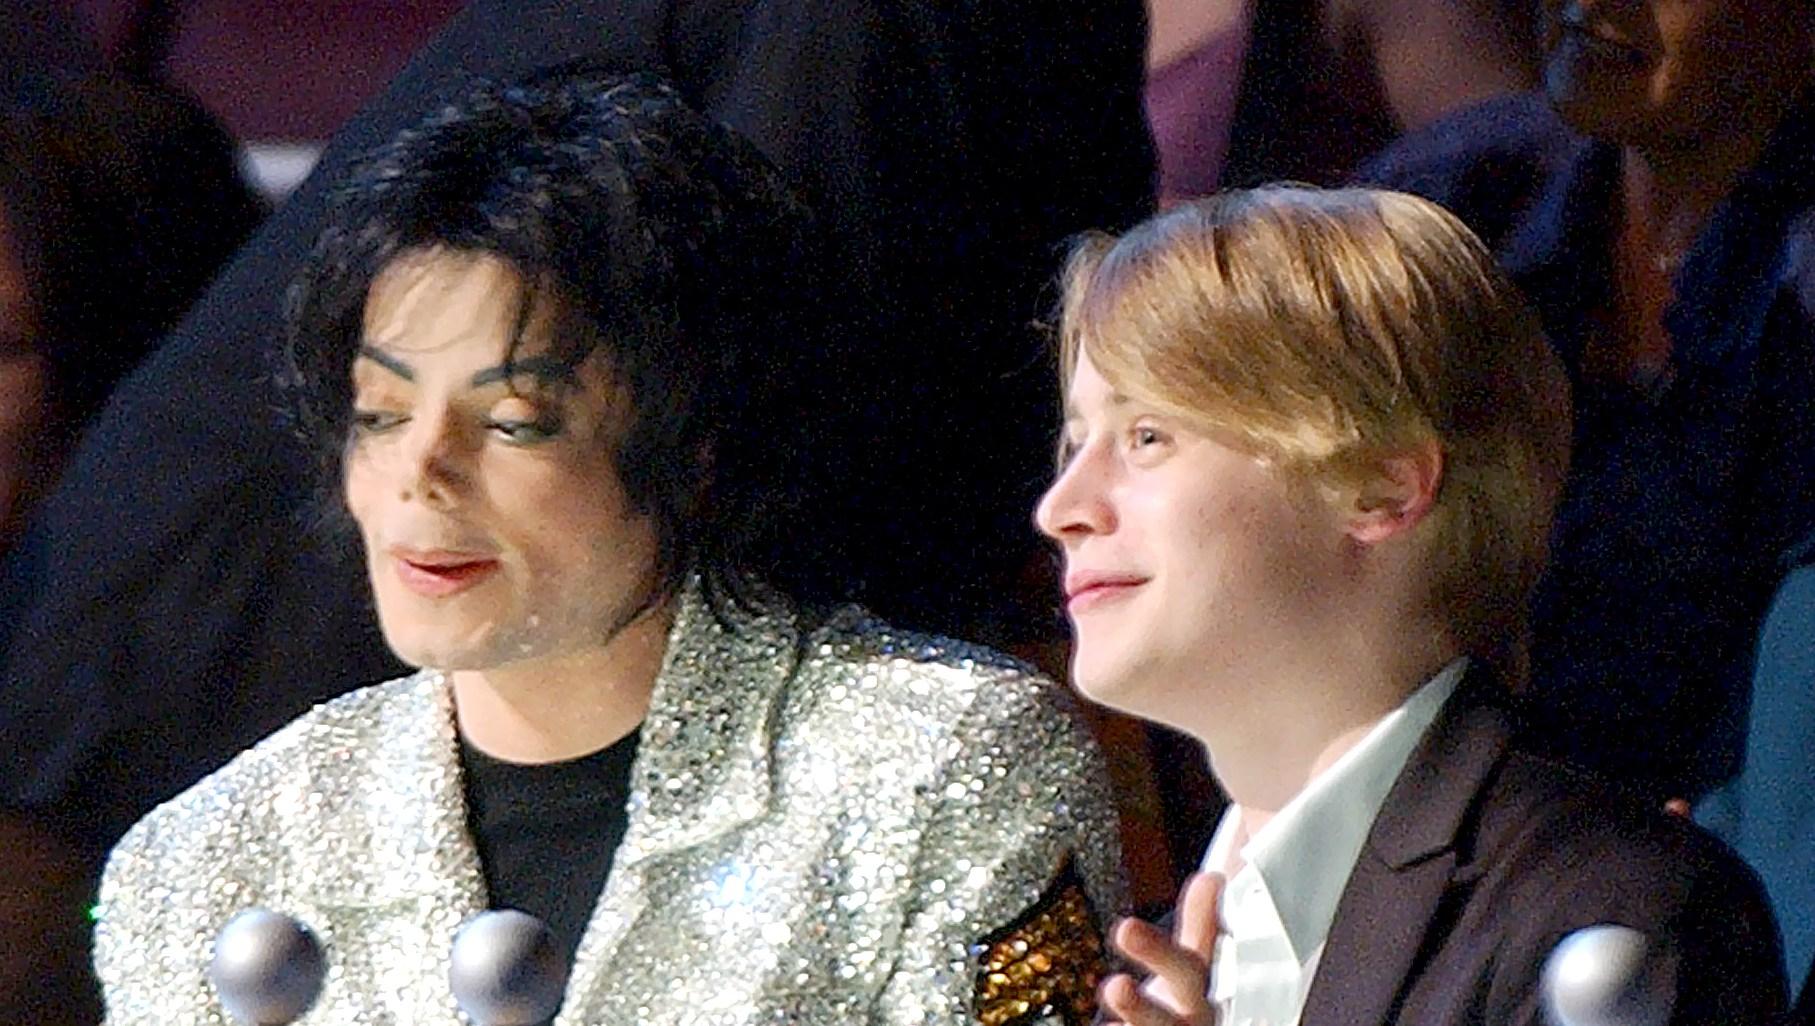 Michael-Jackson-Macaulay-Culkin-friends